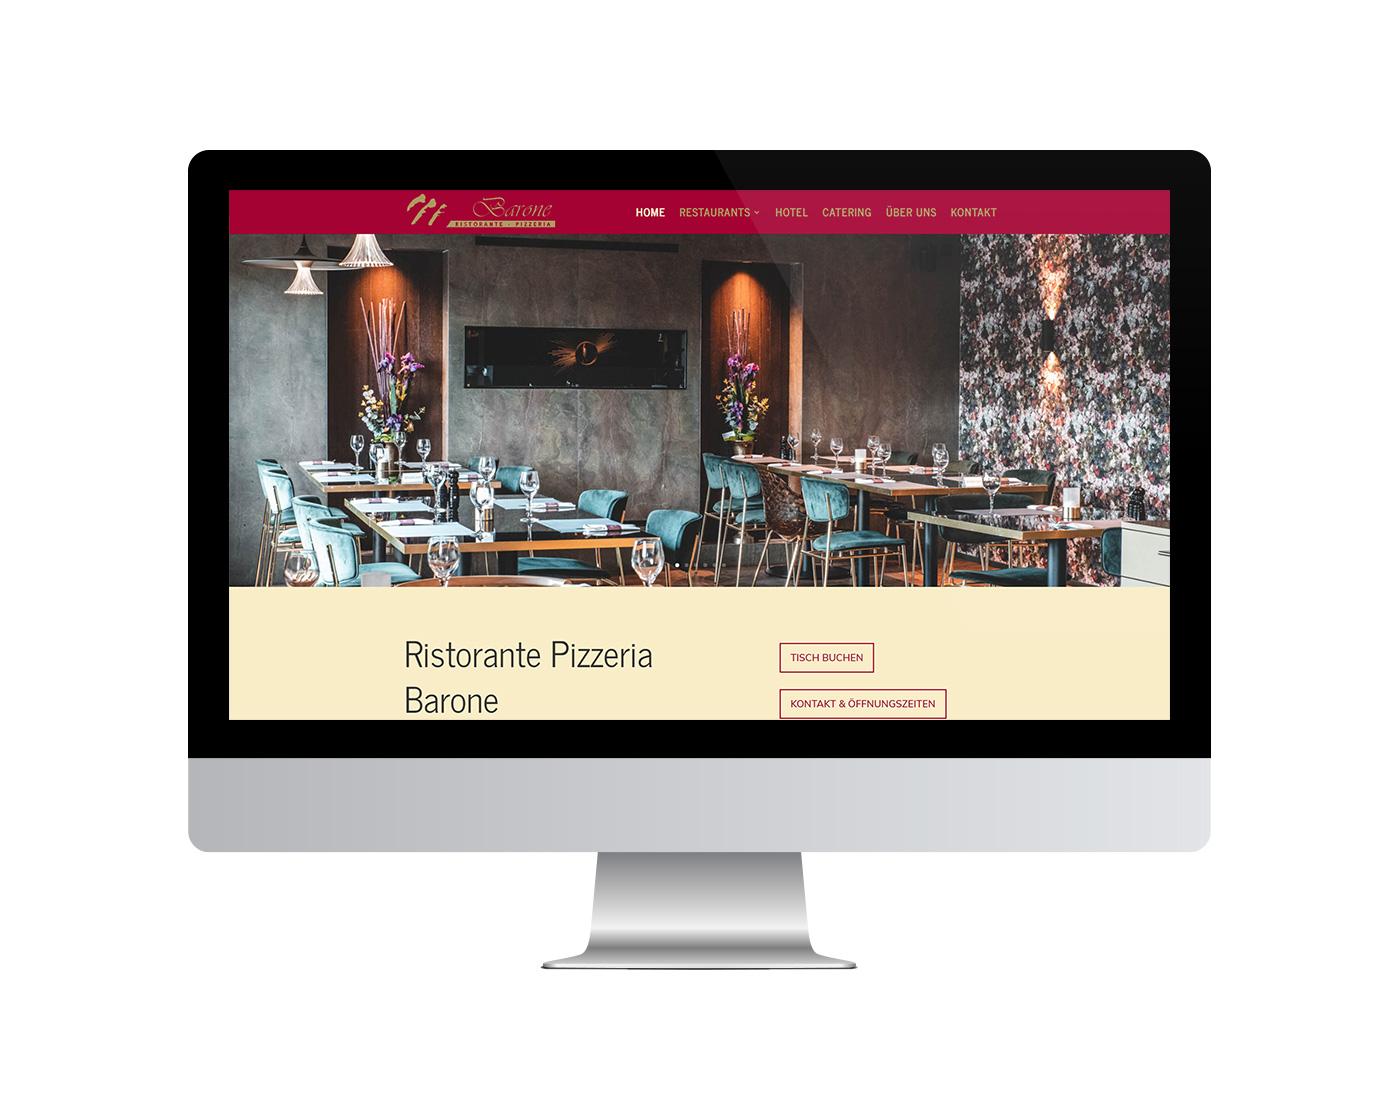 restaurant_barone